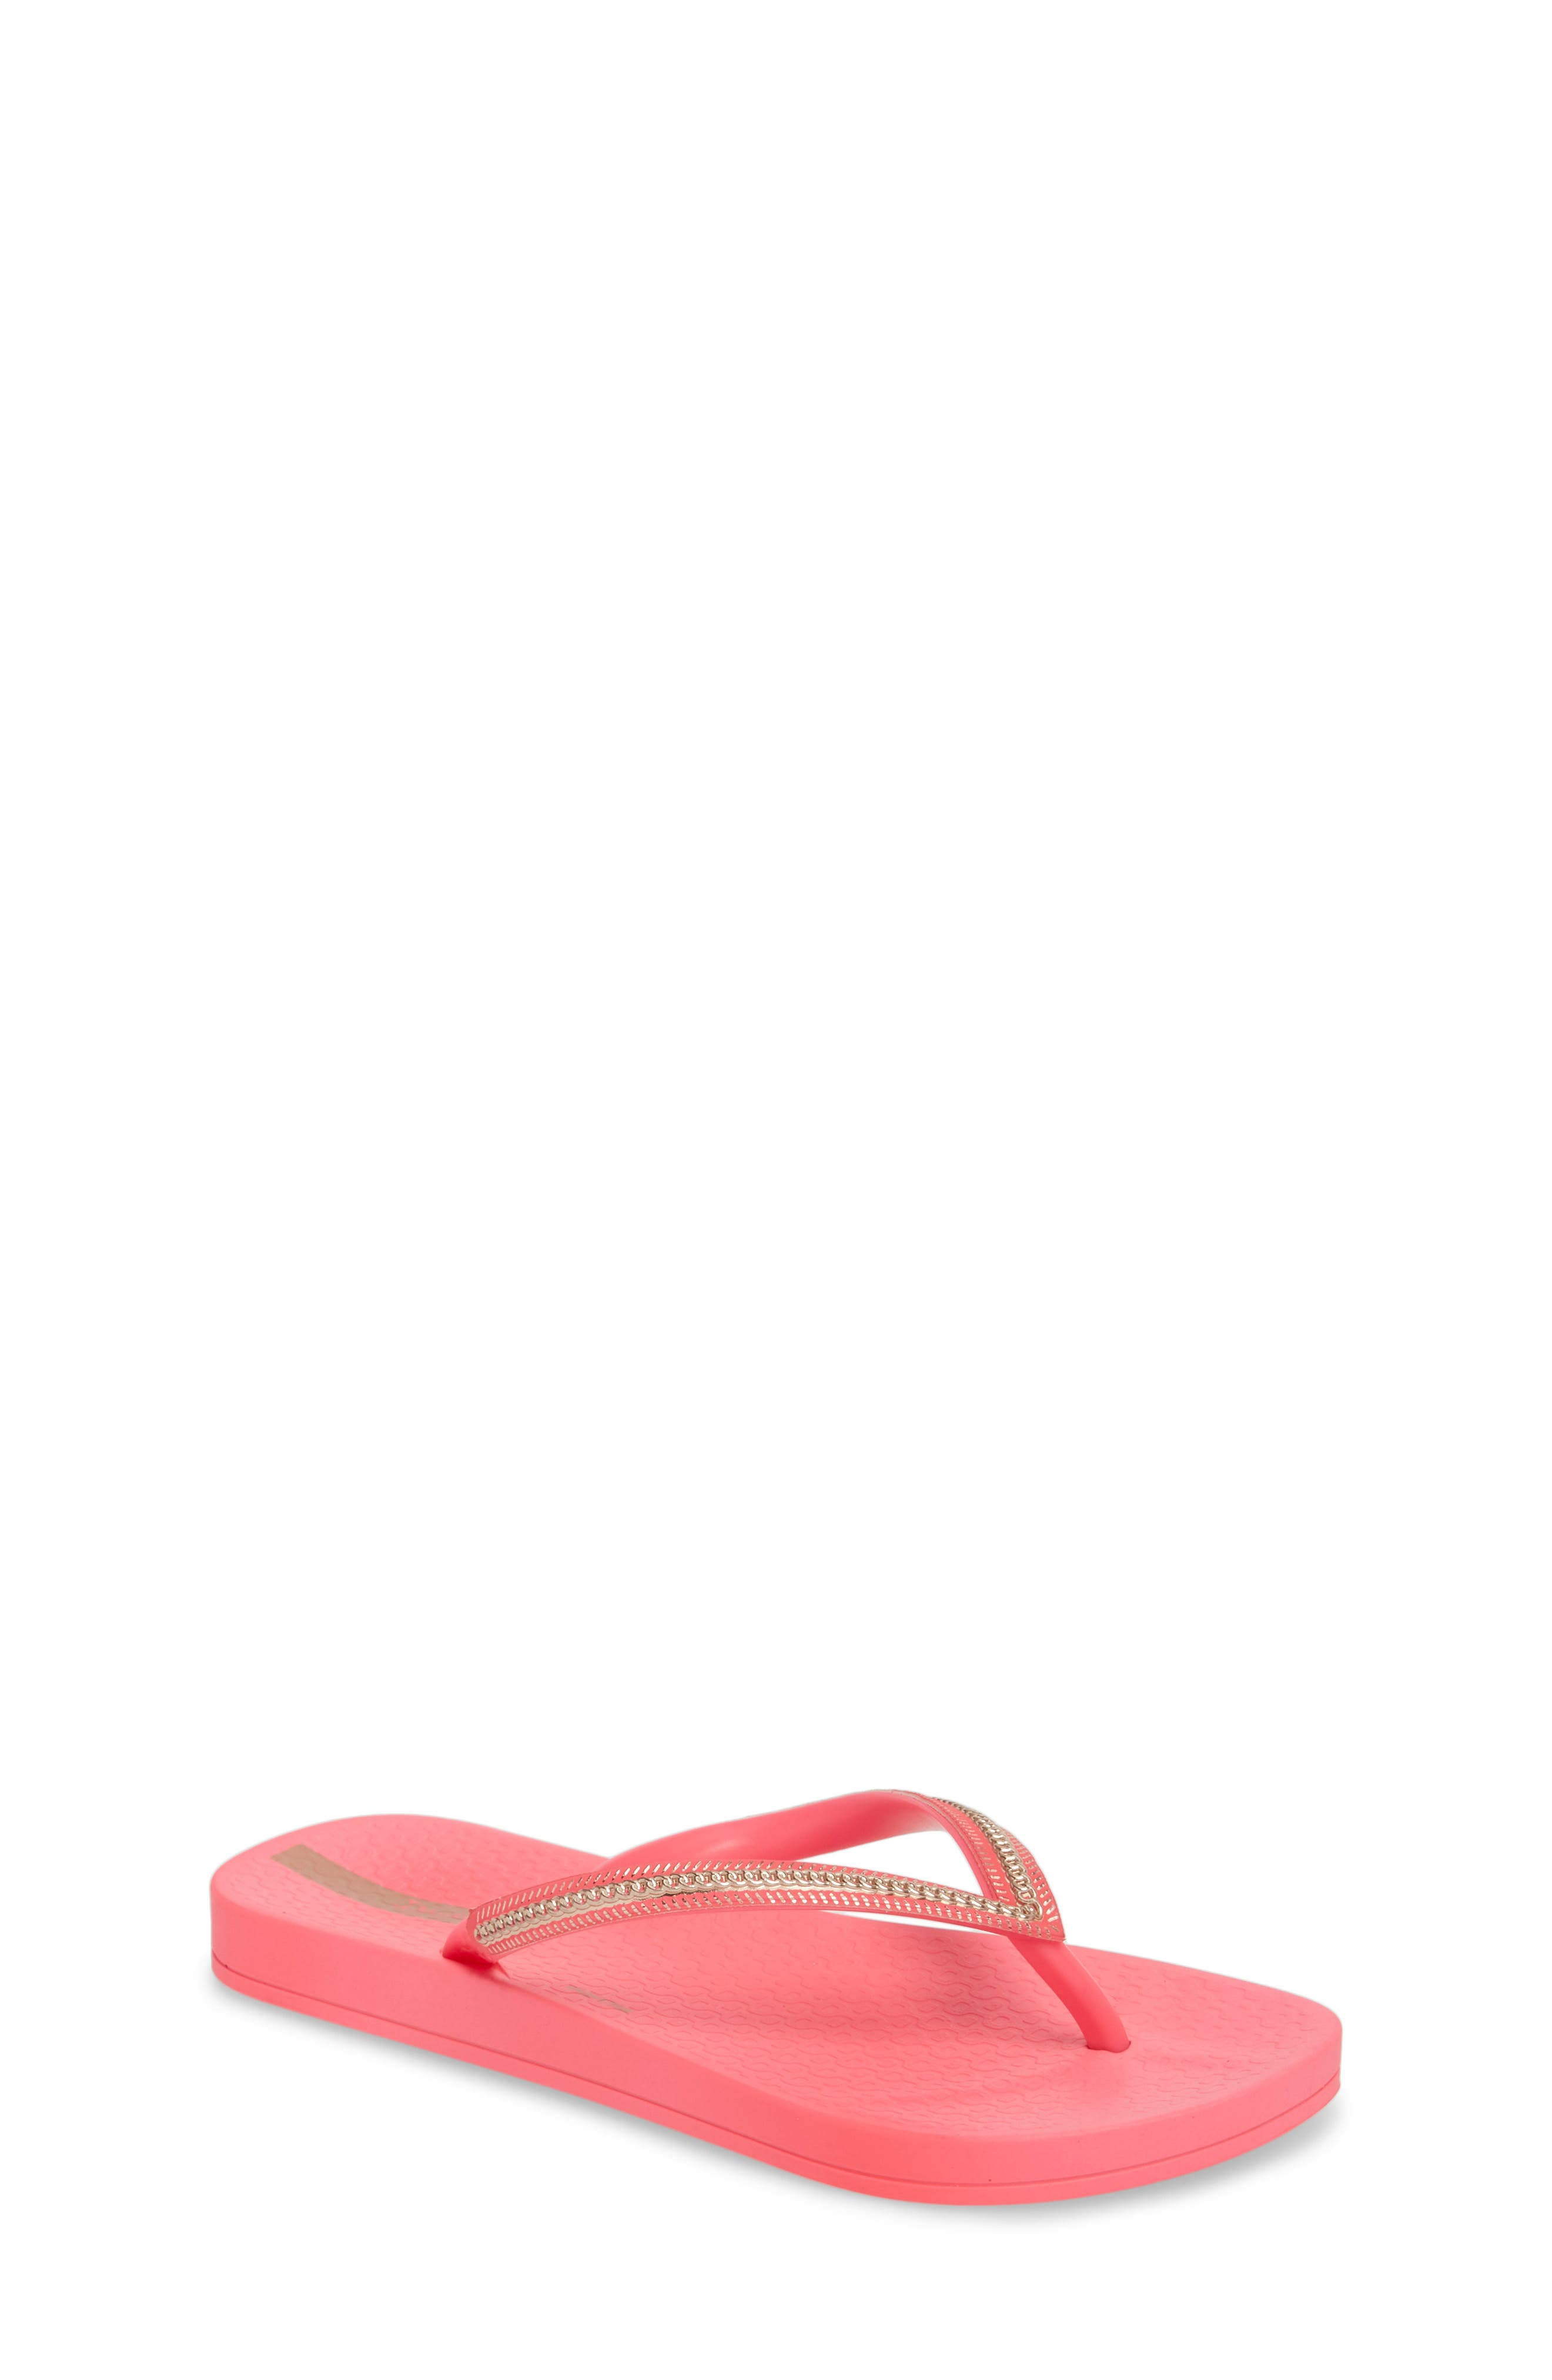 Ana Metallic Flip Flop,                         Main,                         color, Pink Neon/ Rose